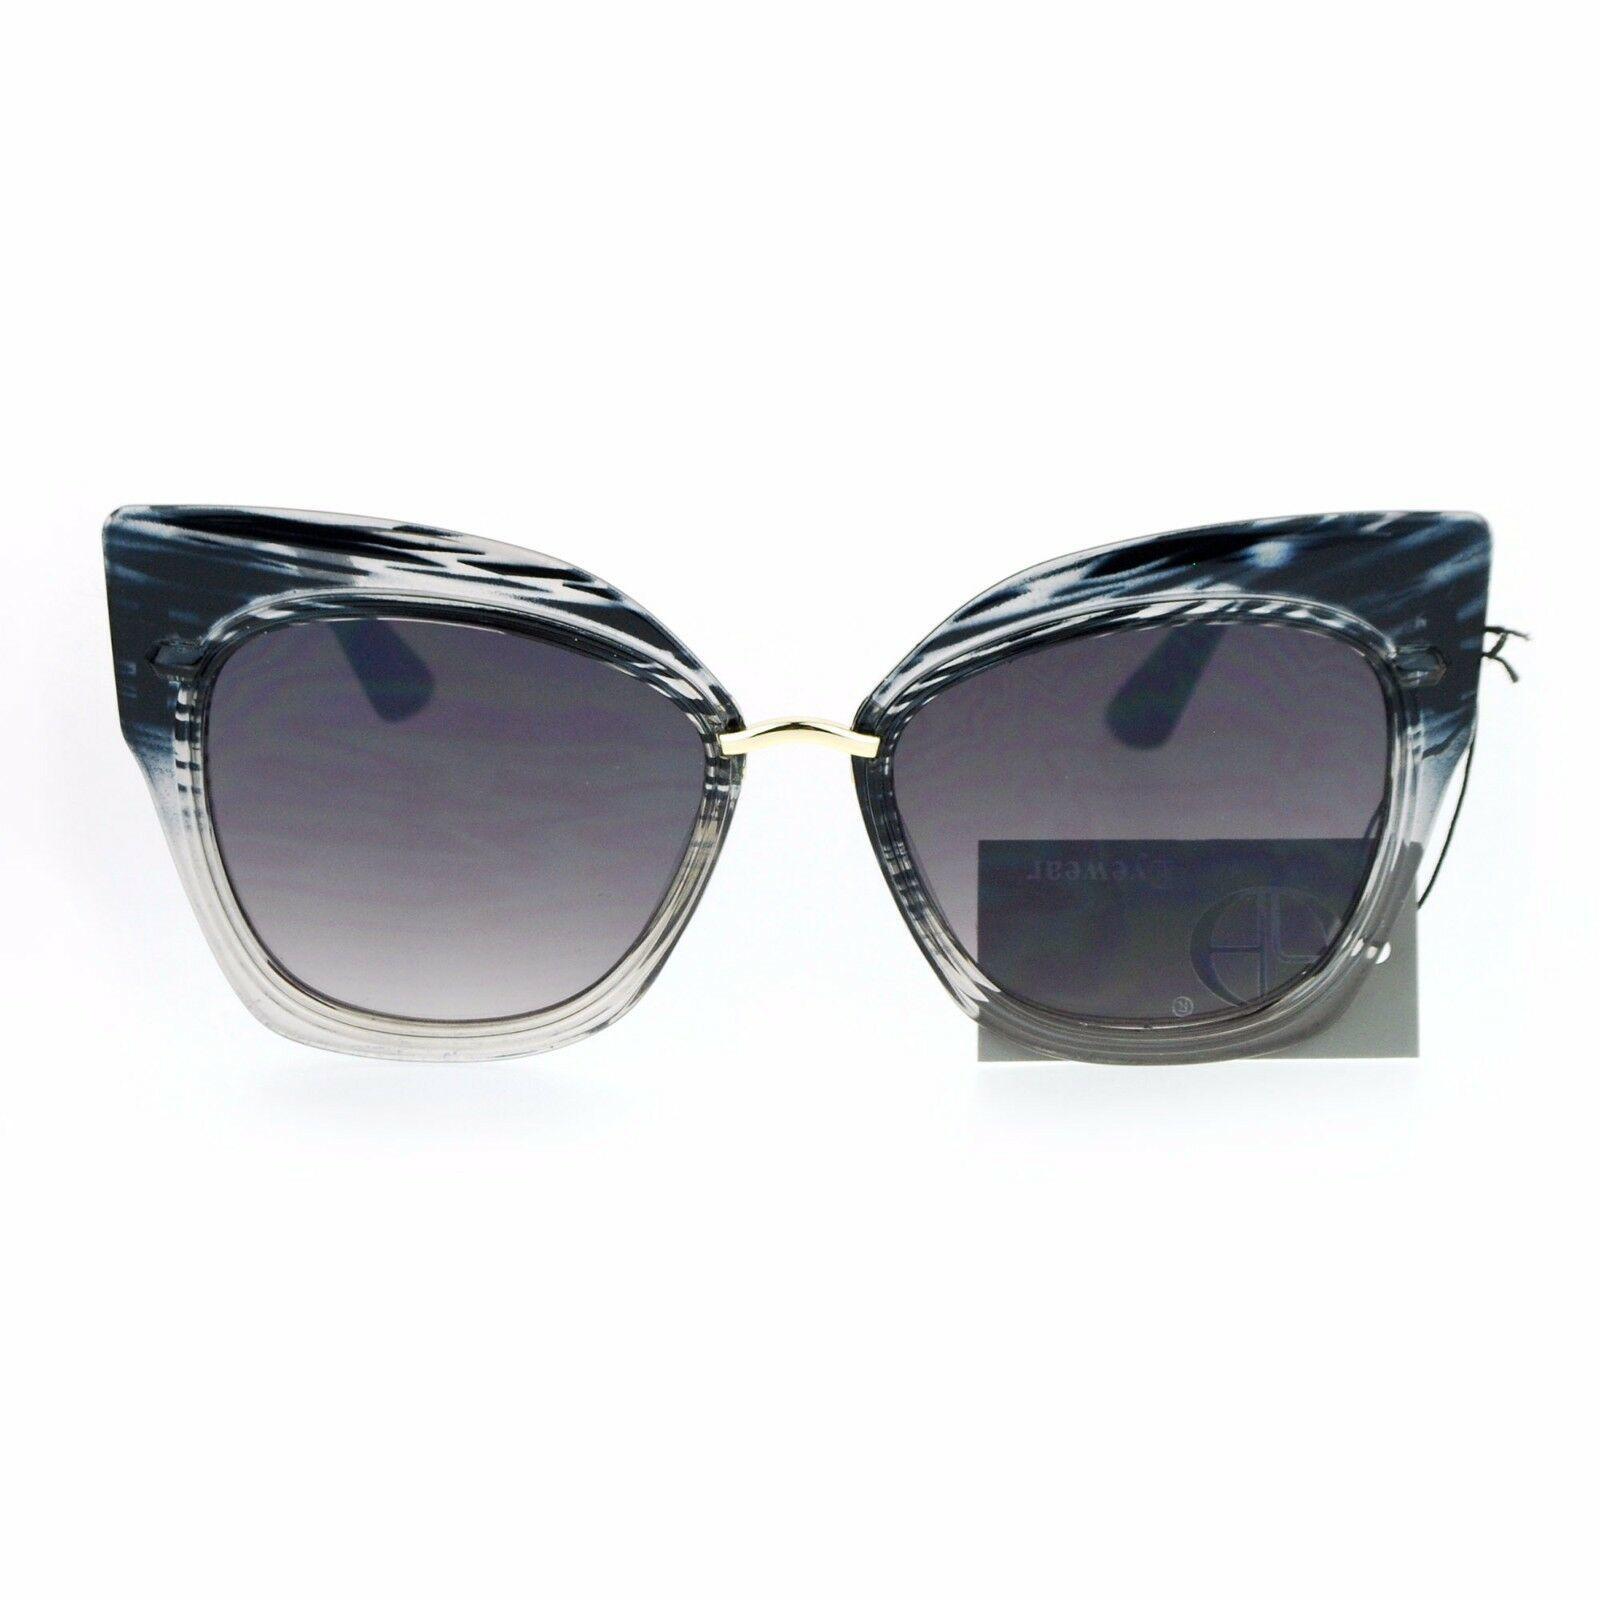 Oversized Fashion Sunglasses Womens Square Cateye Butterfly UV 400 image 10